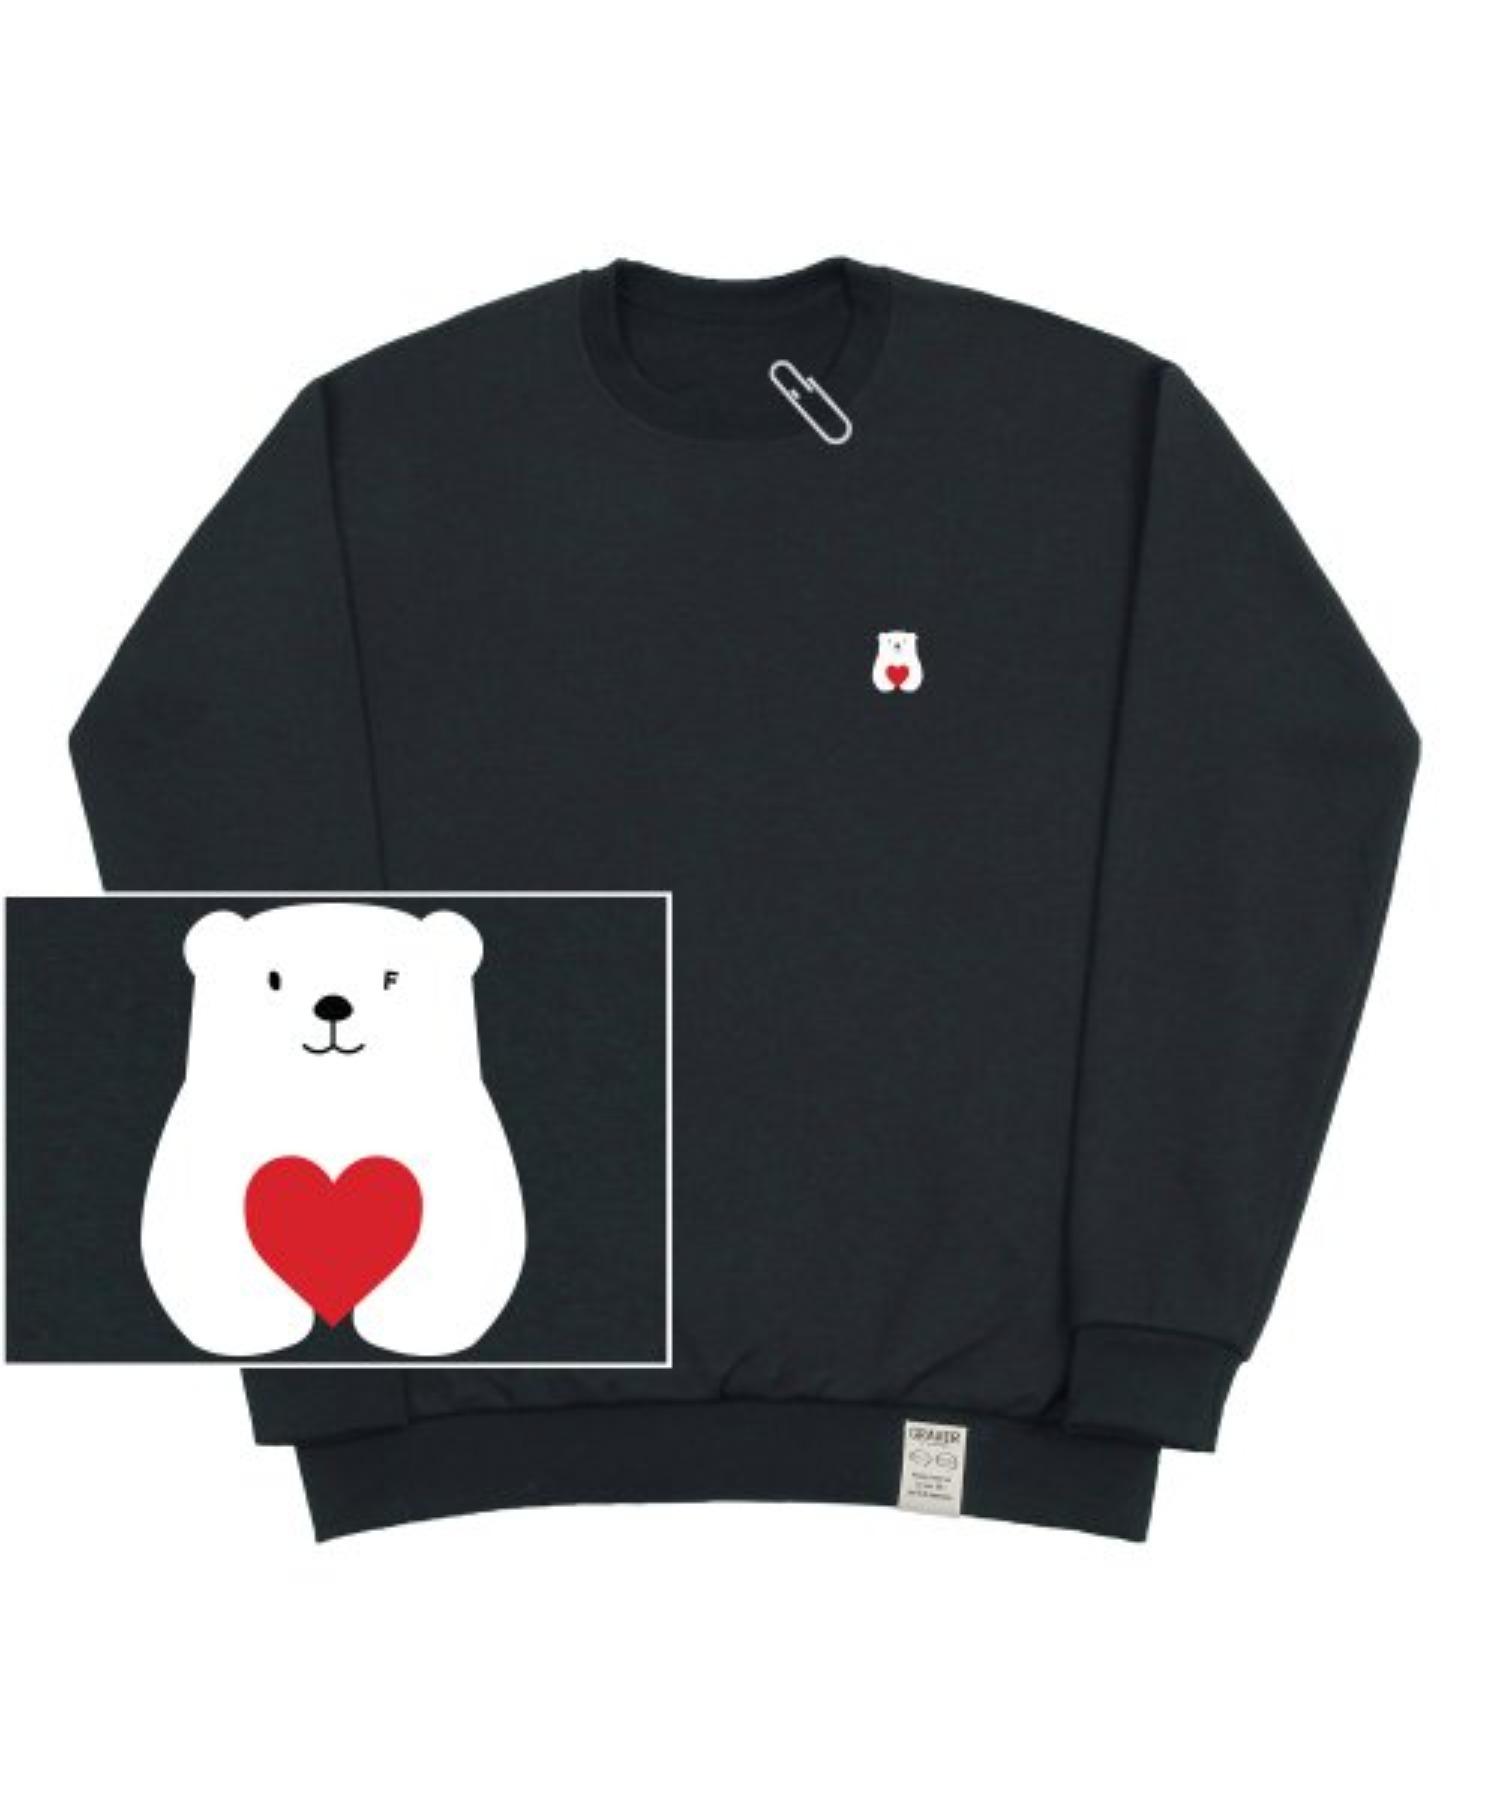 [UNISEX] Small Polar Bear Red Heart White Clip Sweatshirt_Charcoal